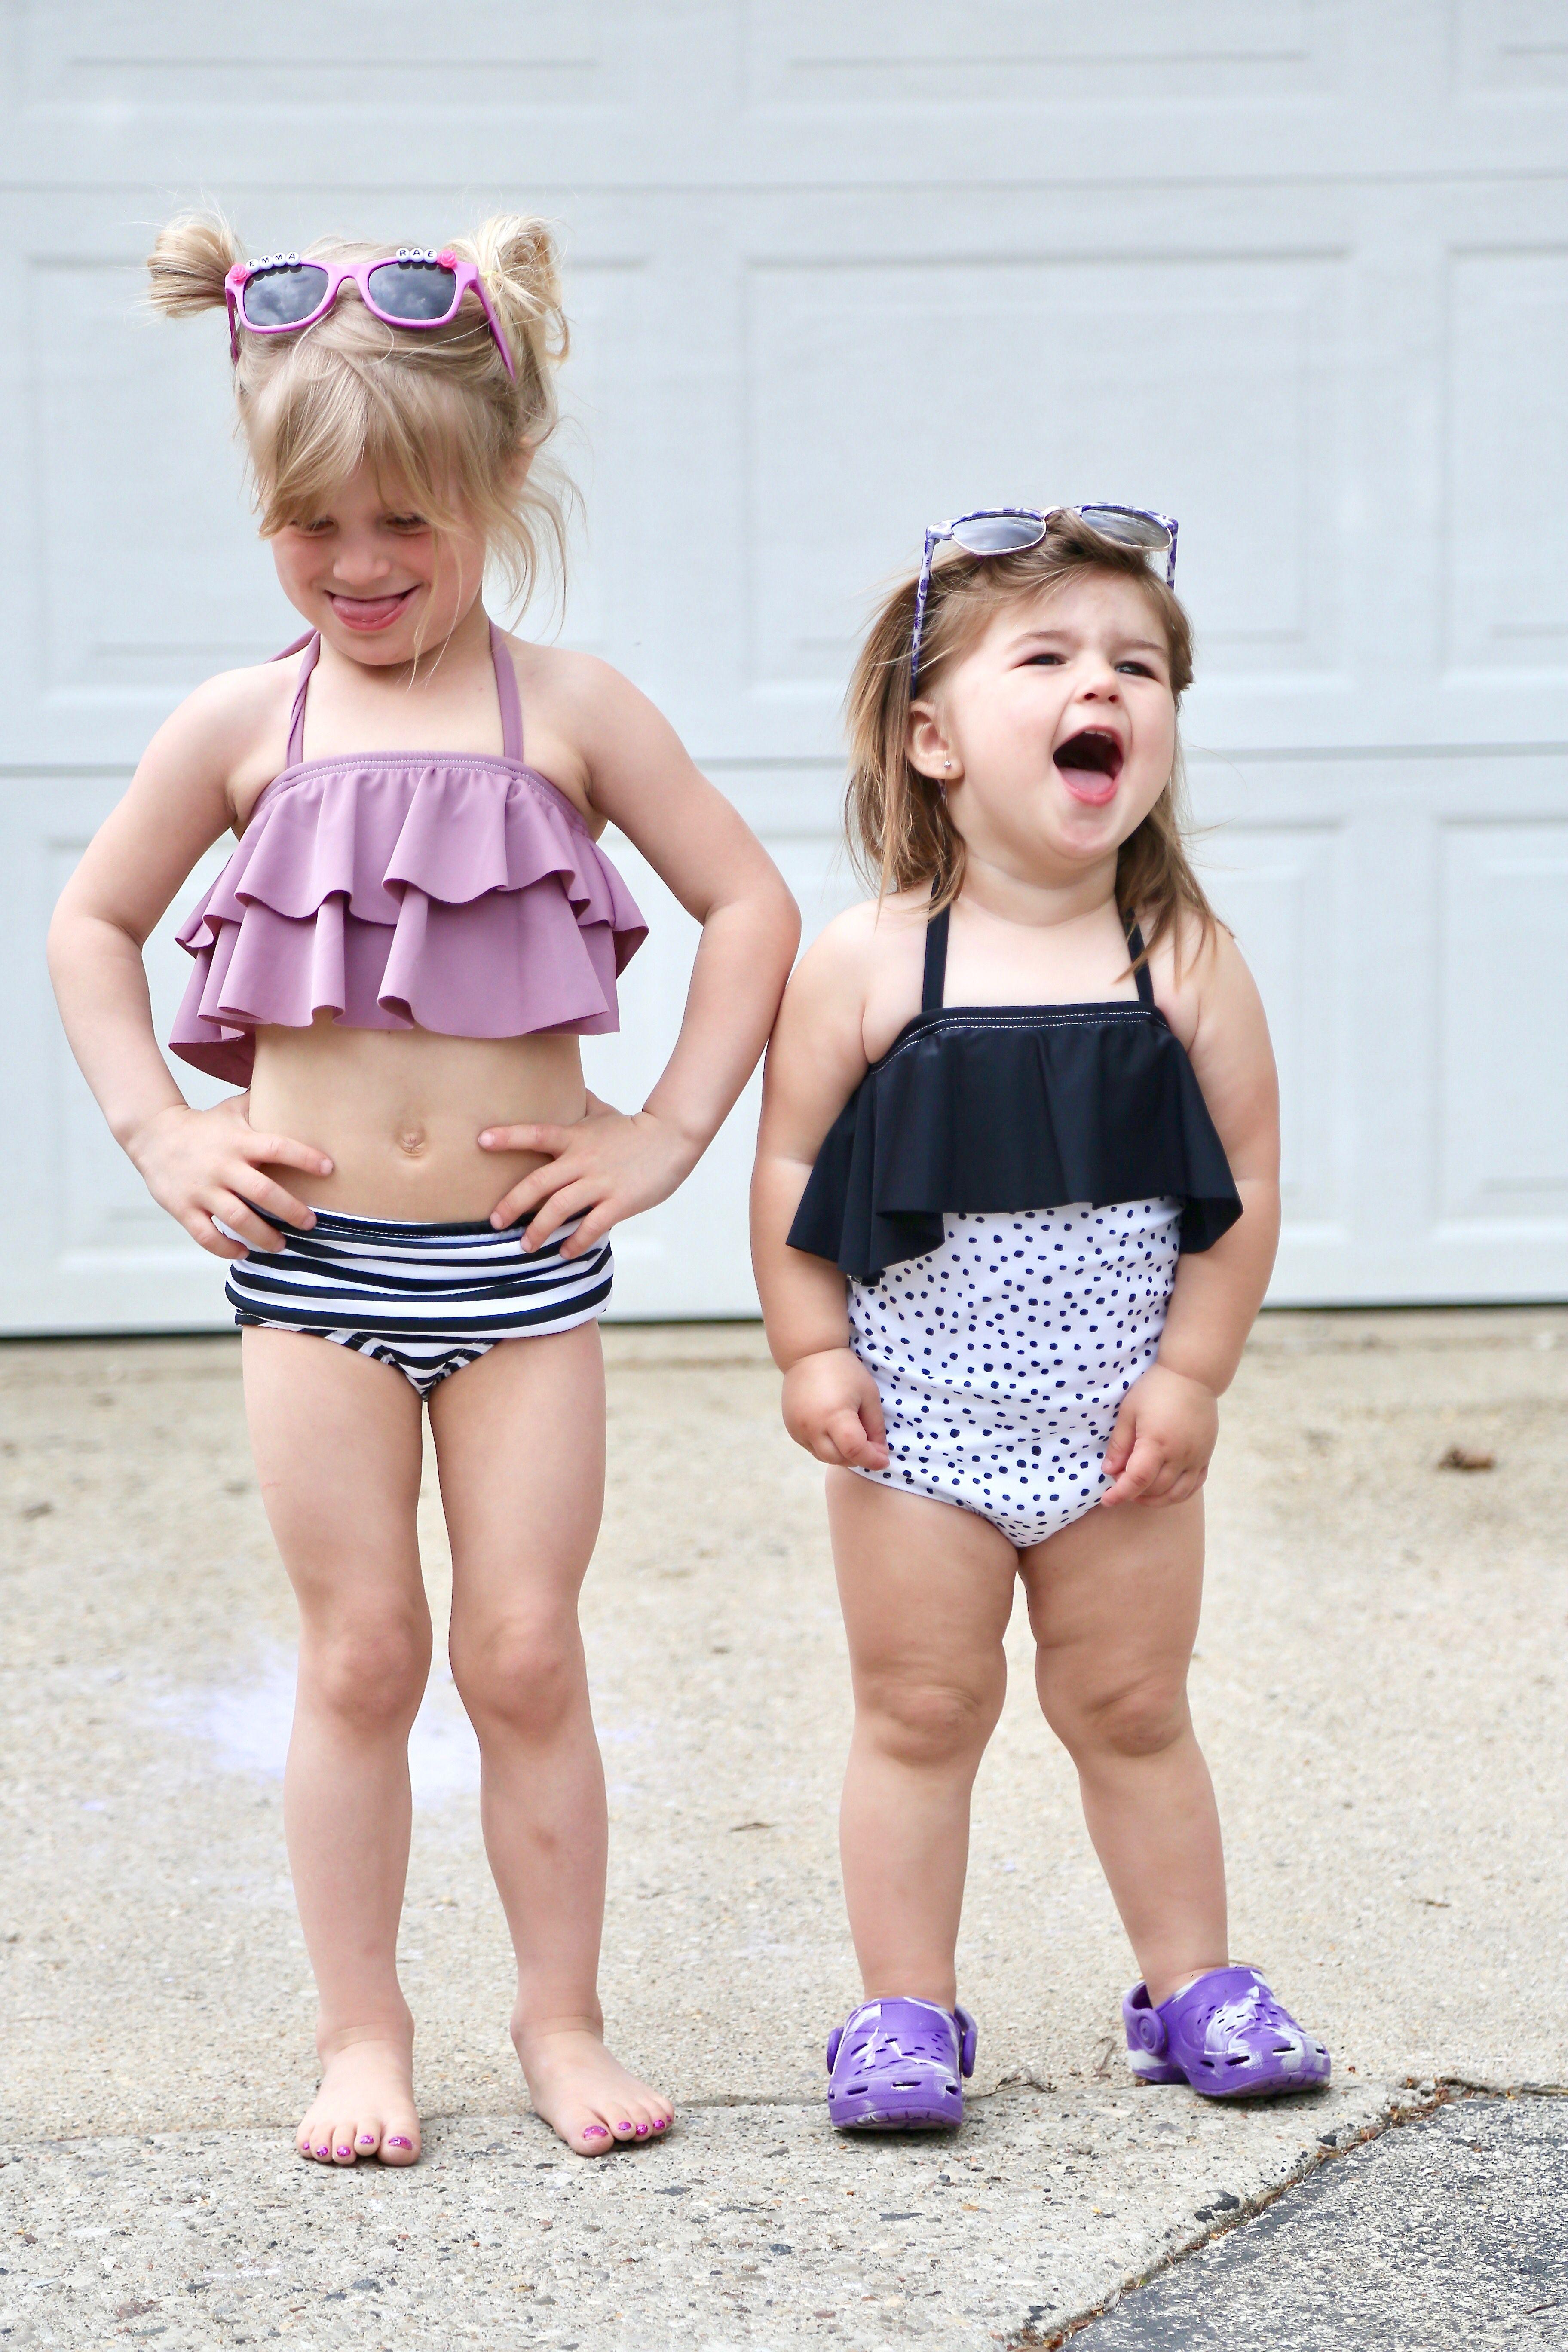 7af4b20725 Trendy girls handmade one piece ruffle monochrome polka dot swimsuit //  Summer vacation kids bathing